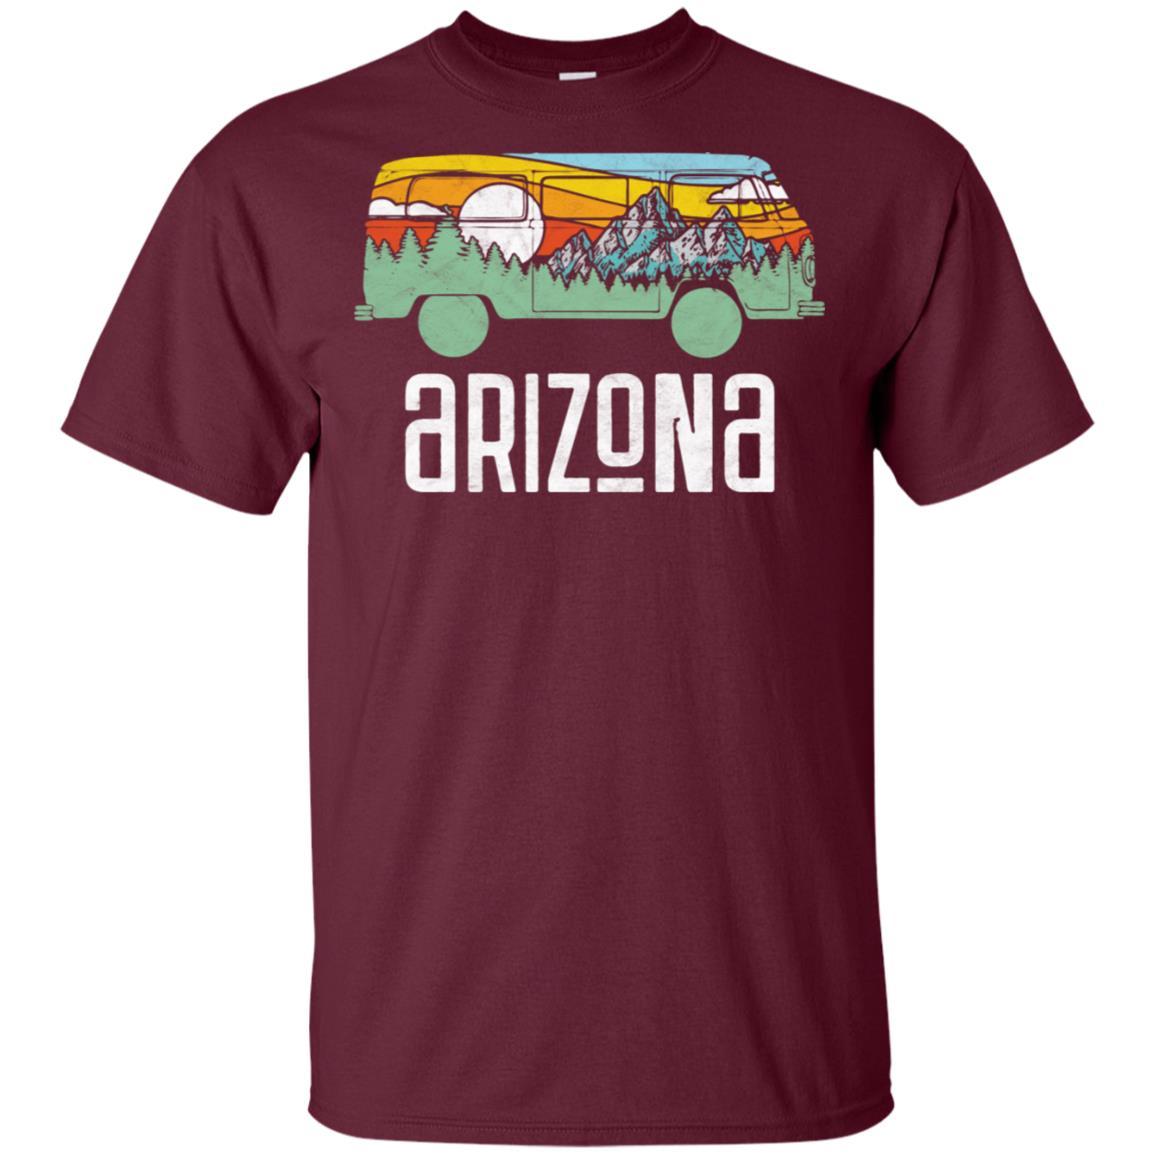 Retro Arizona Outdoor Hippie Van Nature Design T Unisex Short Sleeve